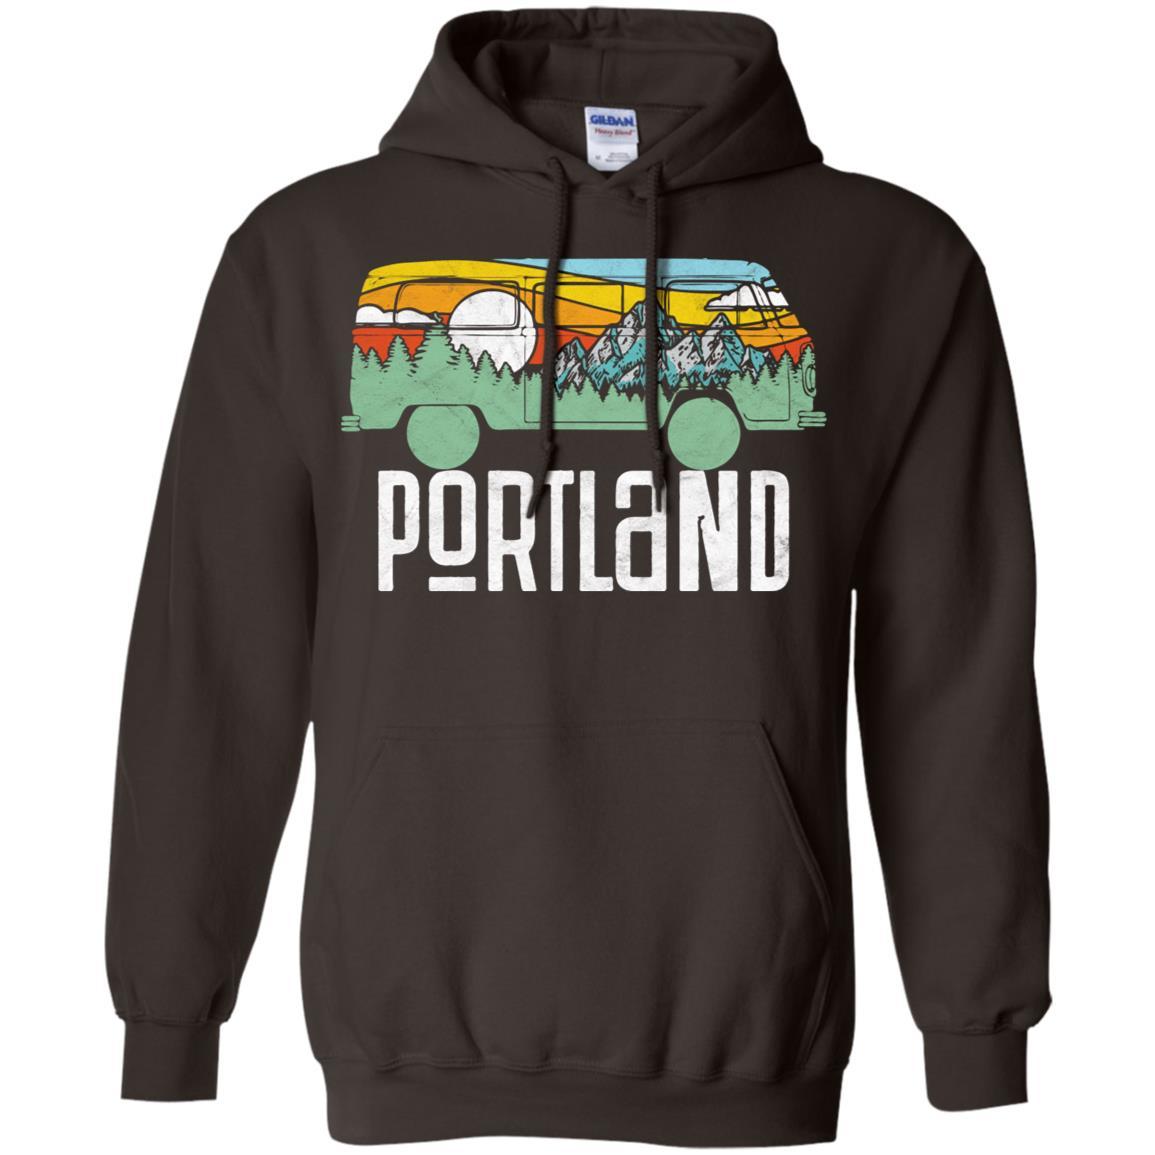 Retro Porland Oregon Outdoor Hippie Van Pullover Hoodie